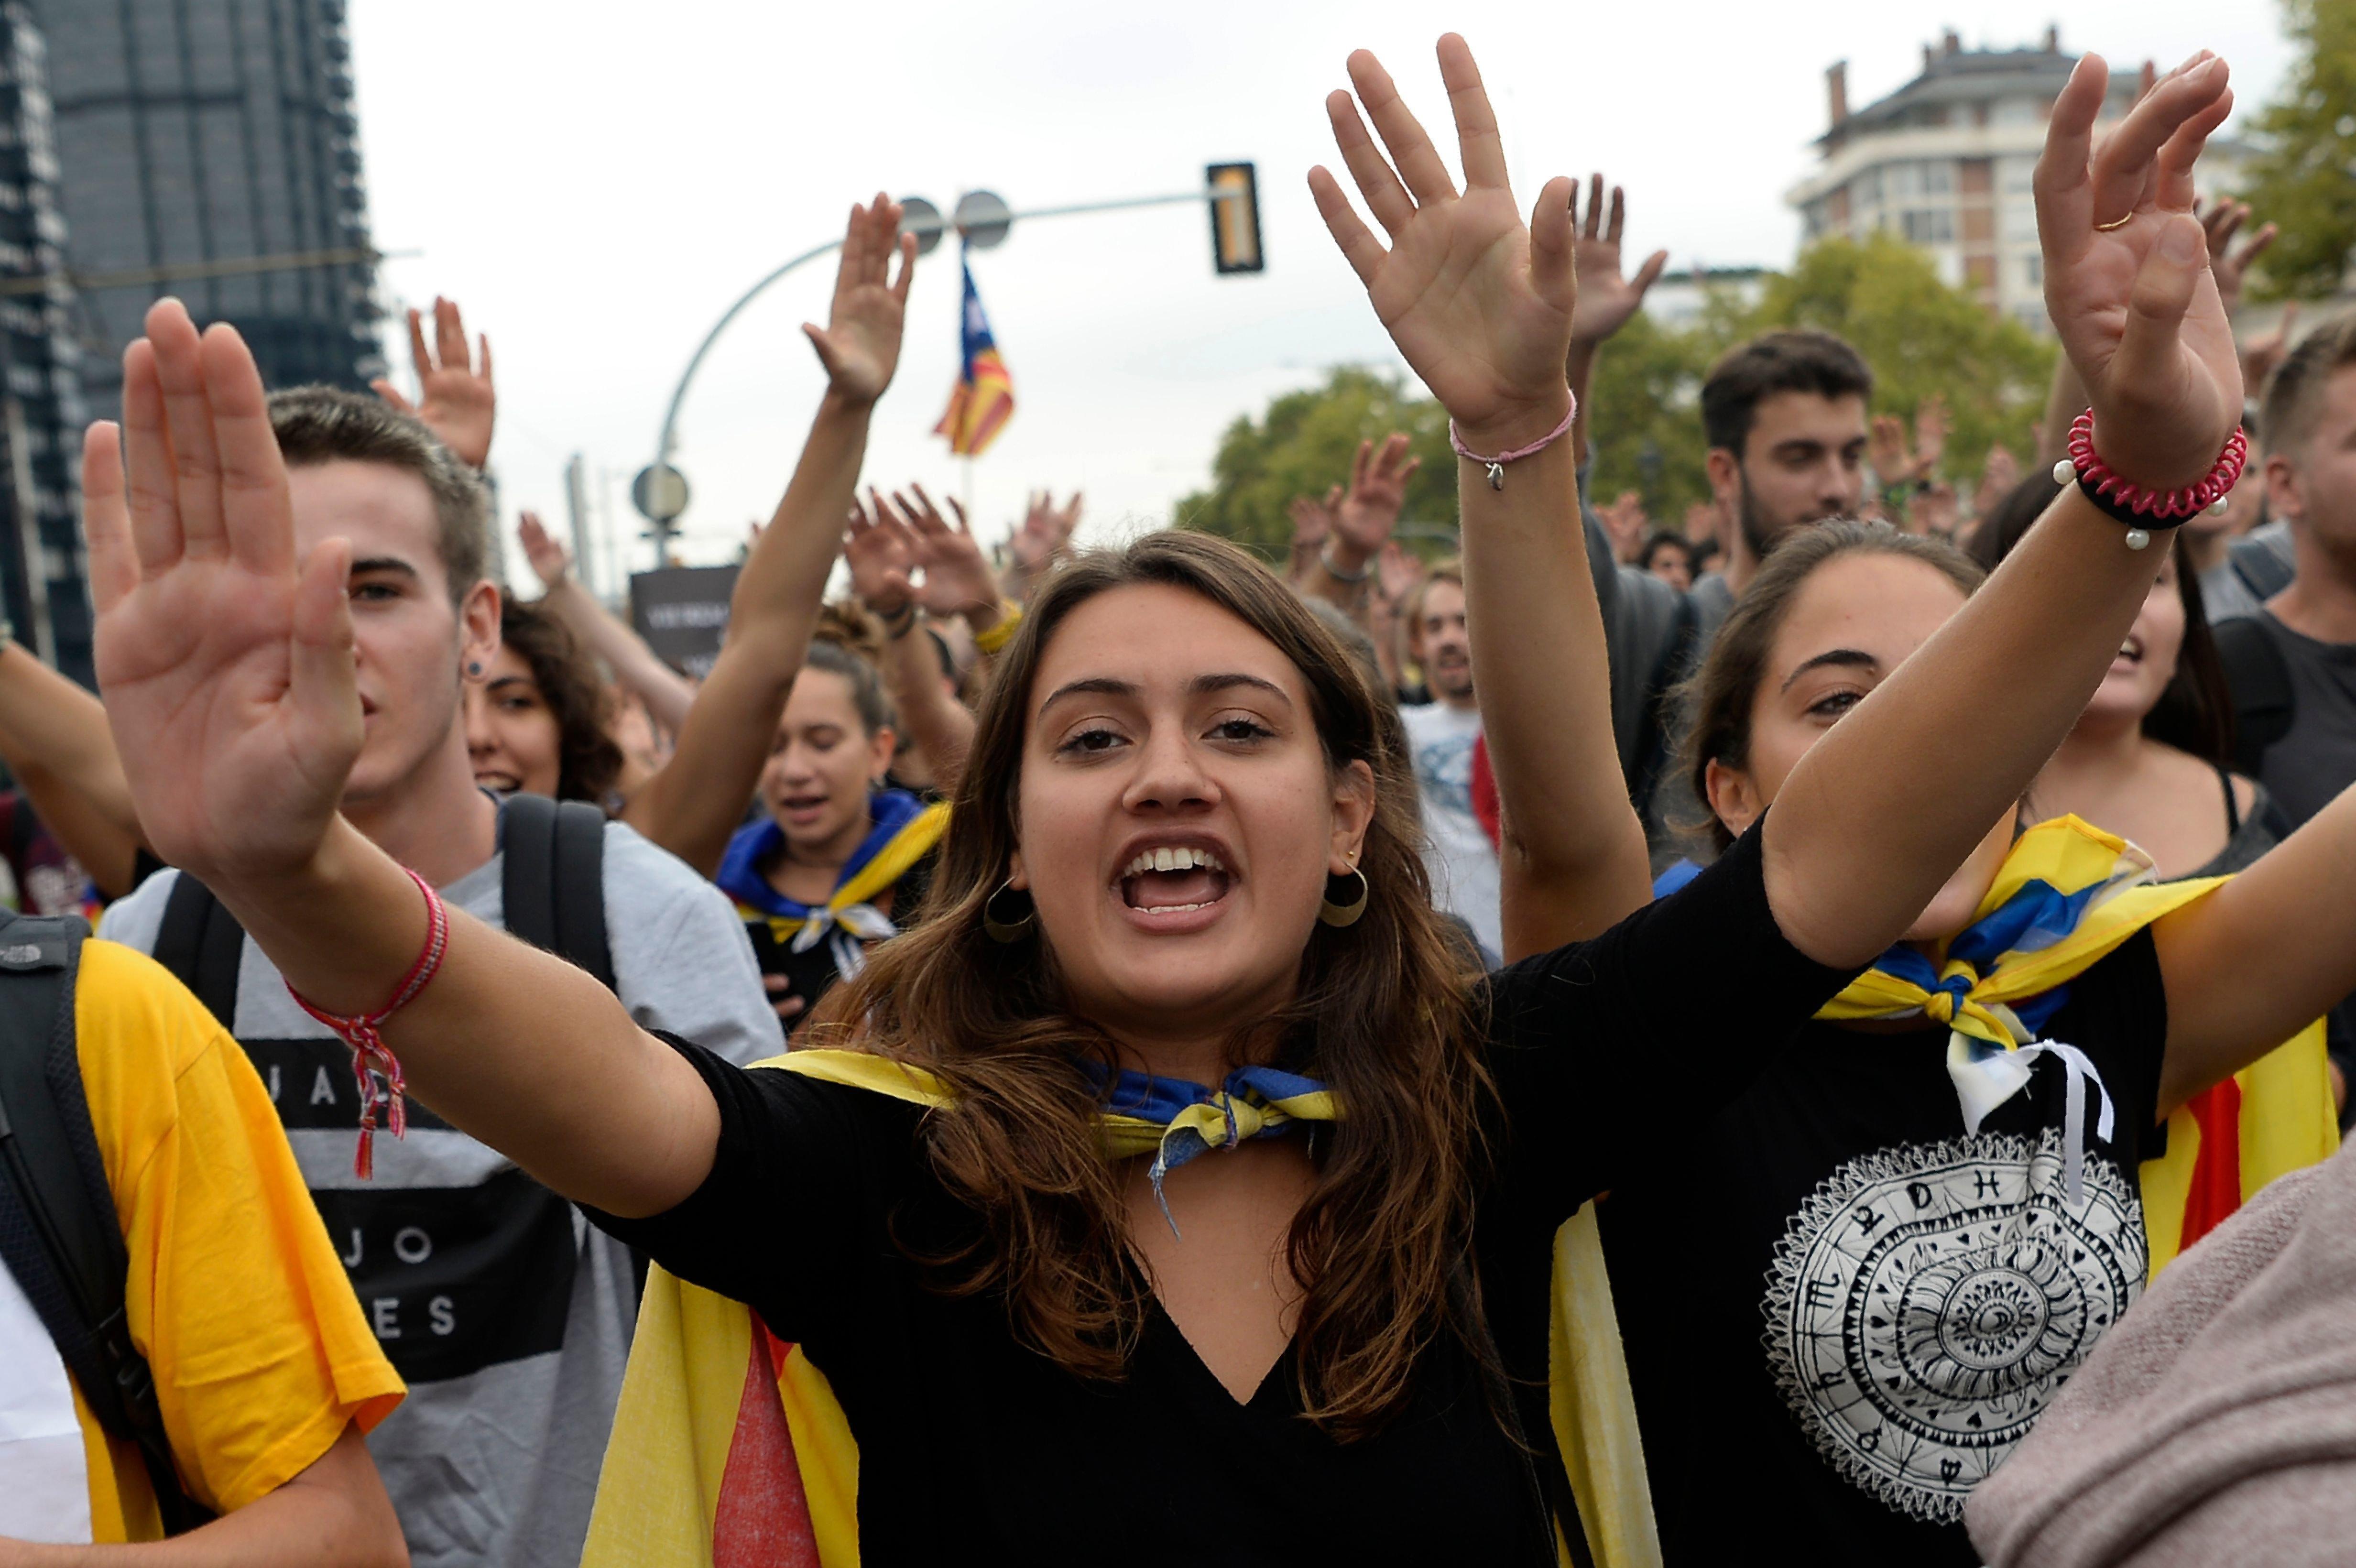 Catalan students during a pro-referendum demonstrationin Barcelona, Spain, Sept. 22.